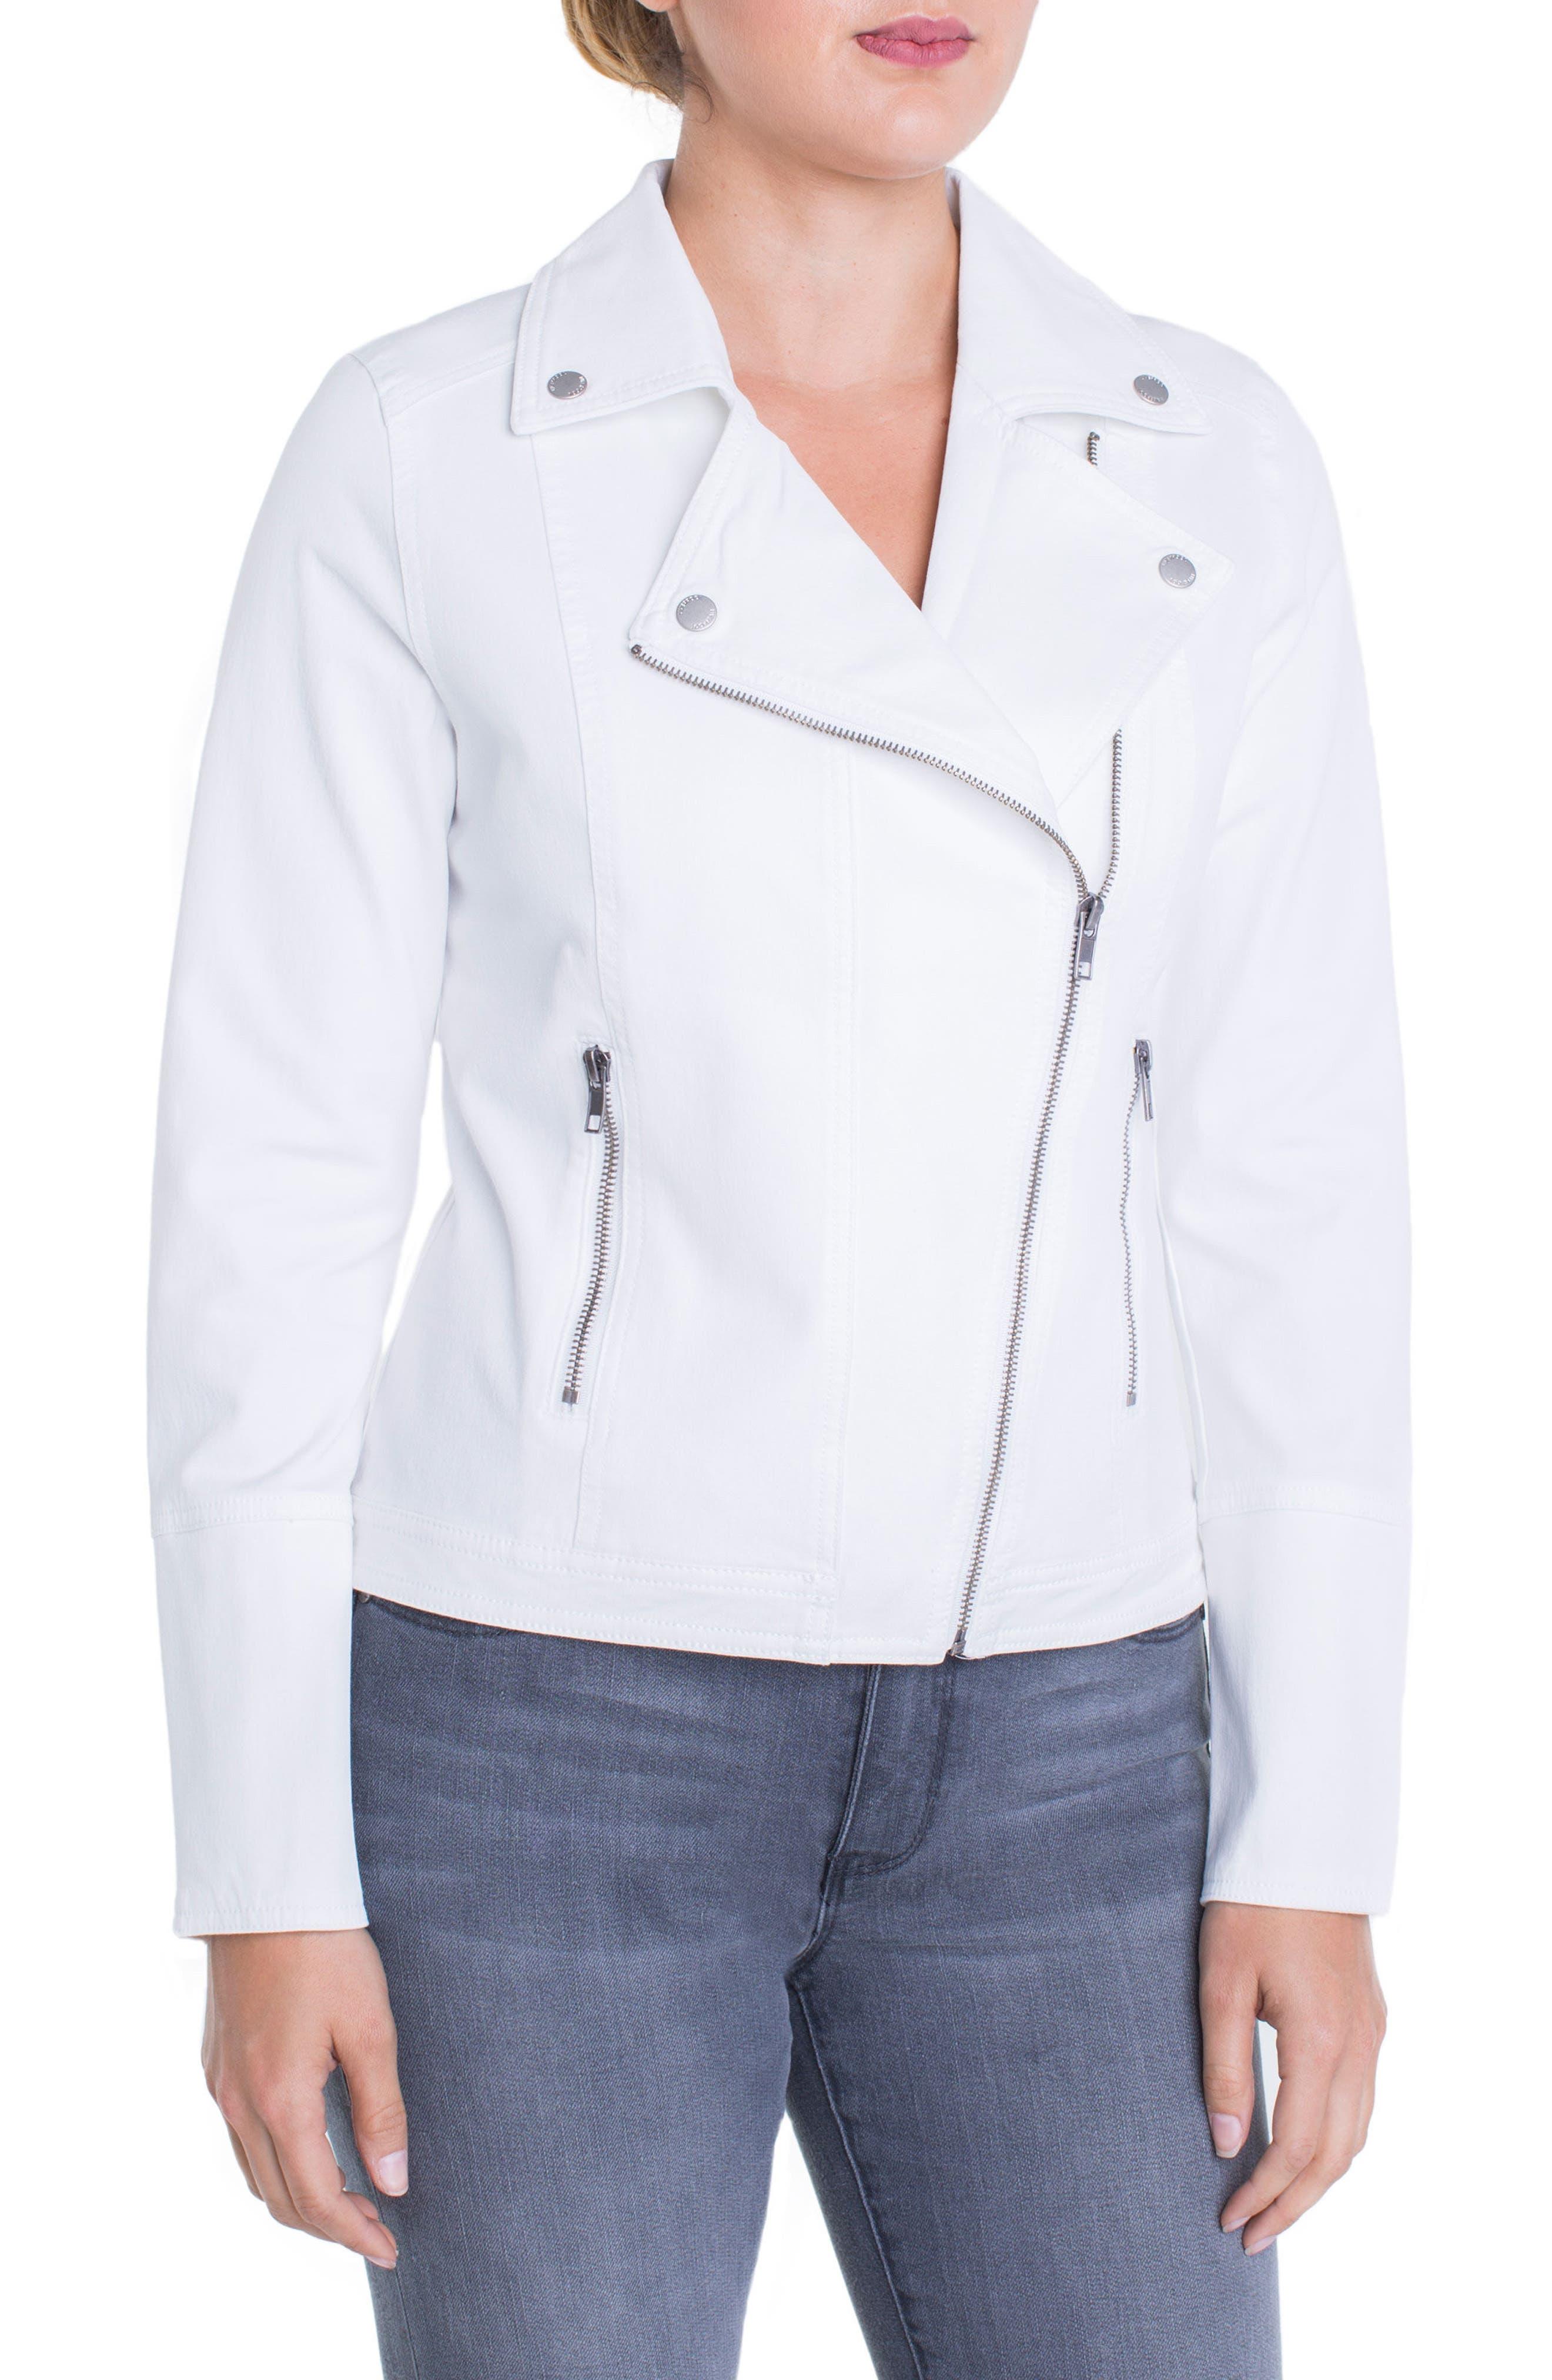 Liverpool Jeans Company Stretch Cotton Moto Jacket